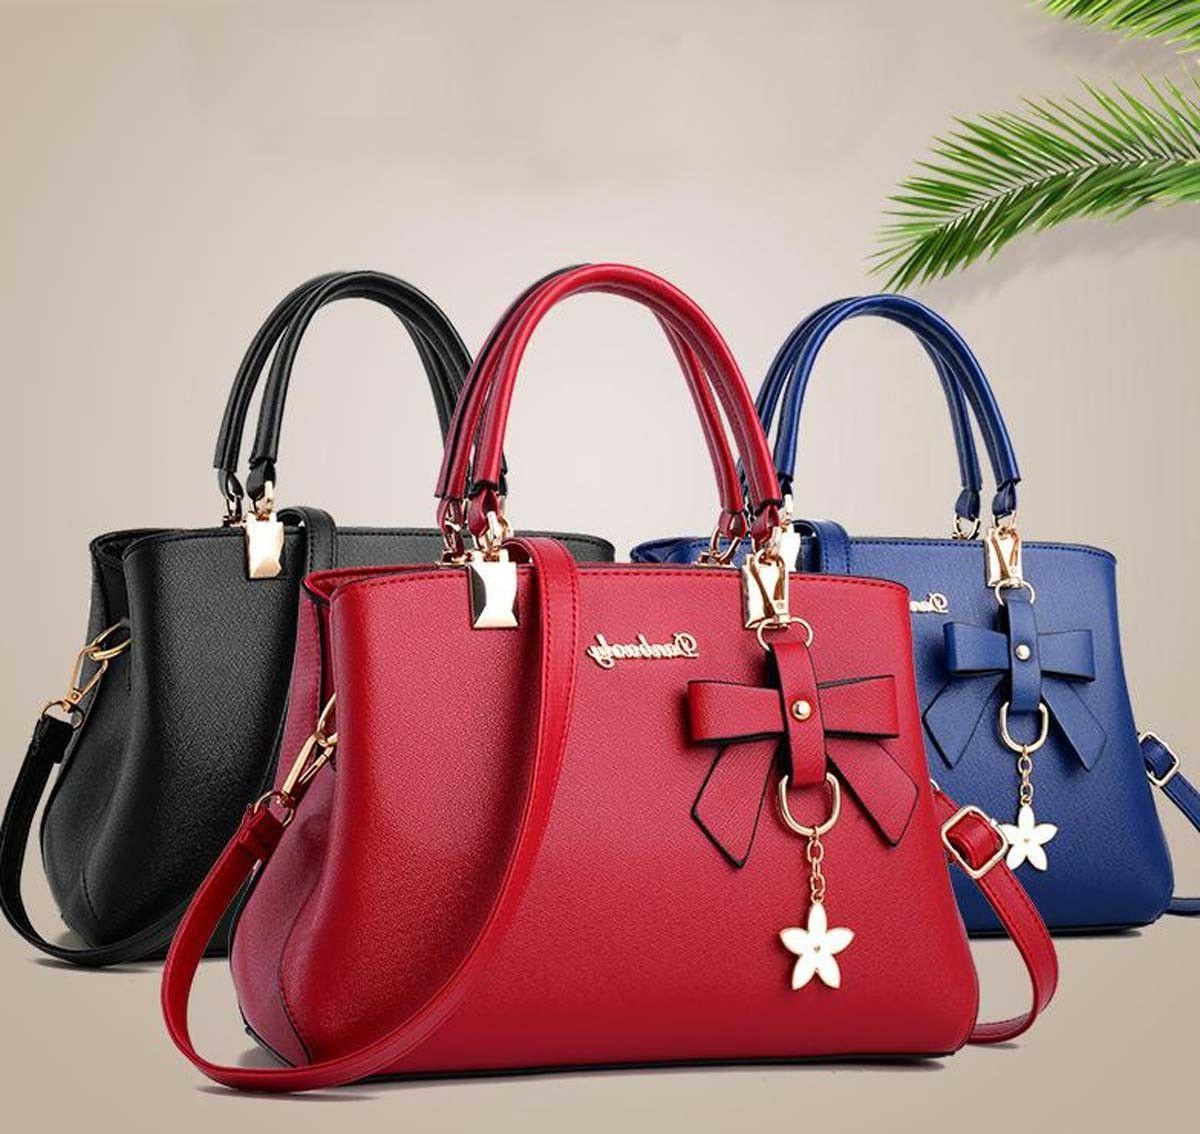 Women Leather Handbags Shoulder Messenger Satchel Tote Crossbody